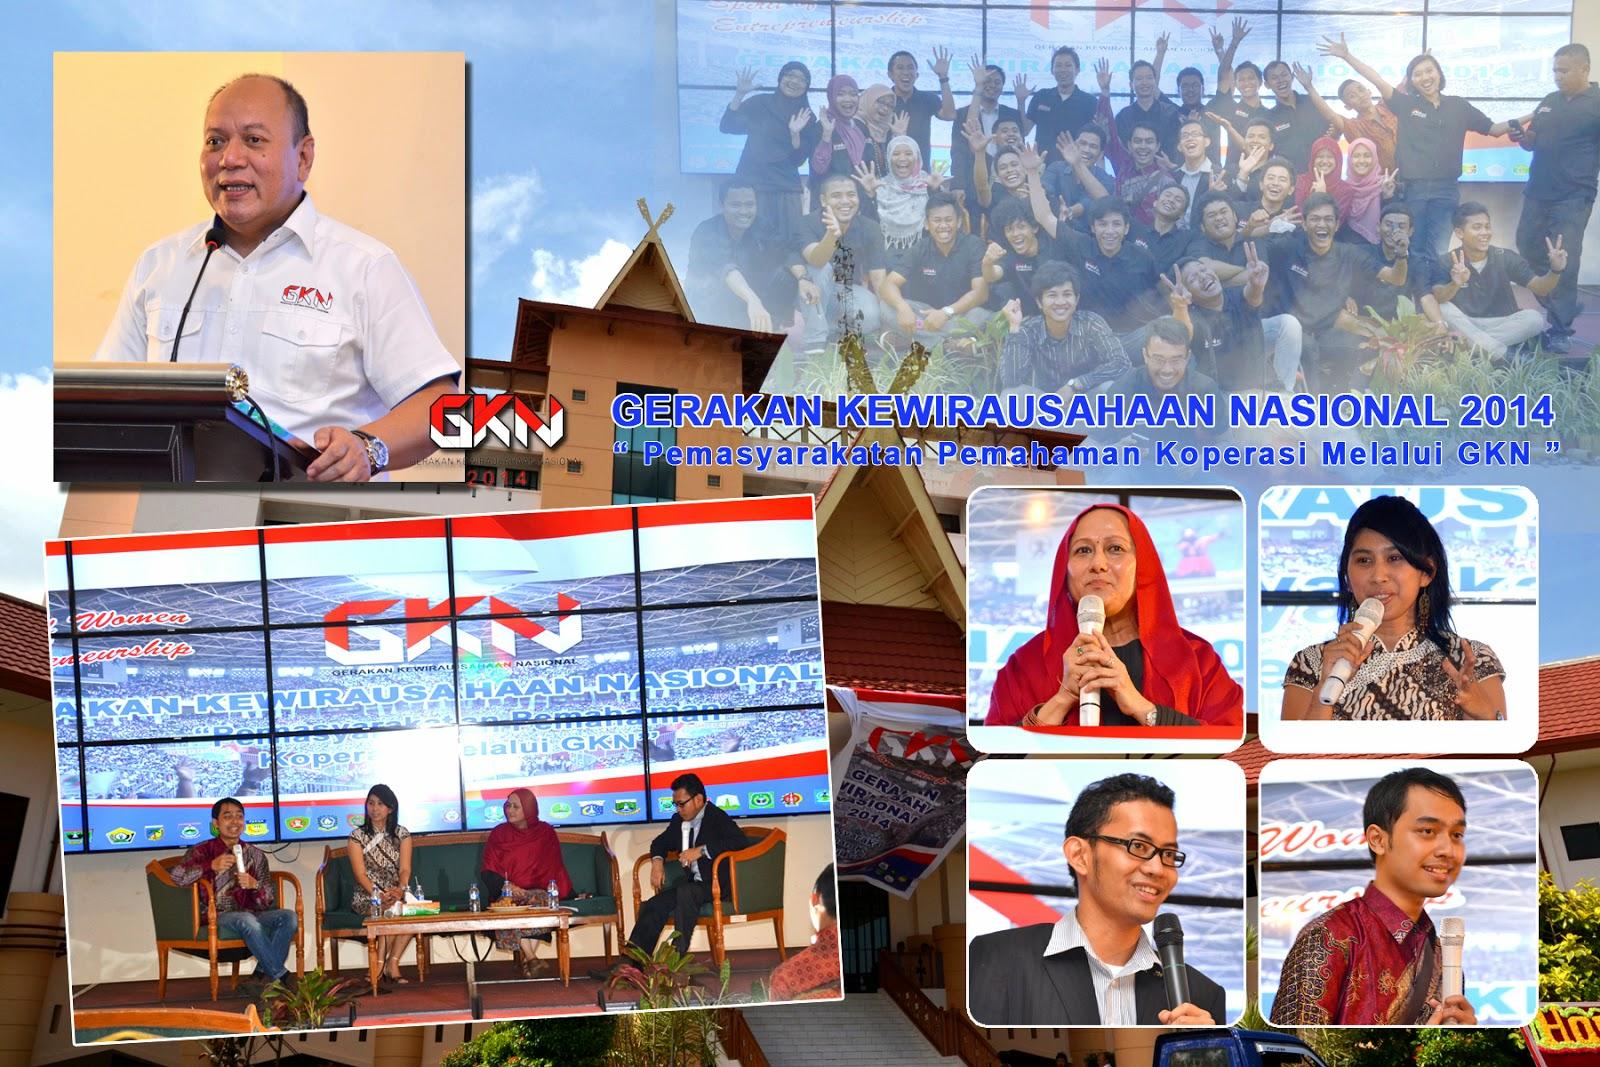 seminar wirausaha motivator nasional muda termuda indonesia pengusaha entrepreneur sukses training motivasi mahasiswa kampus